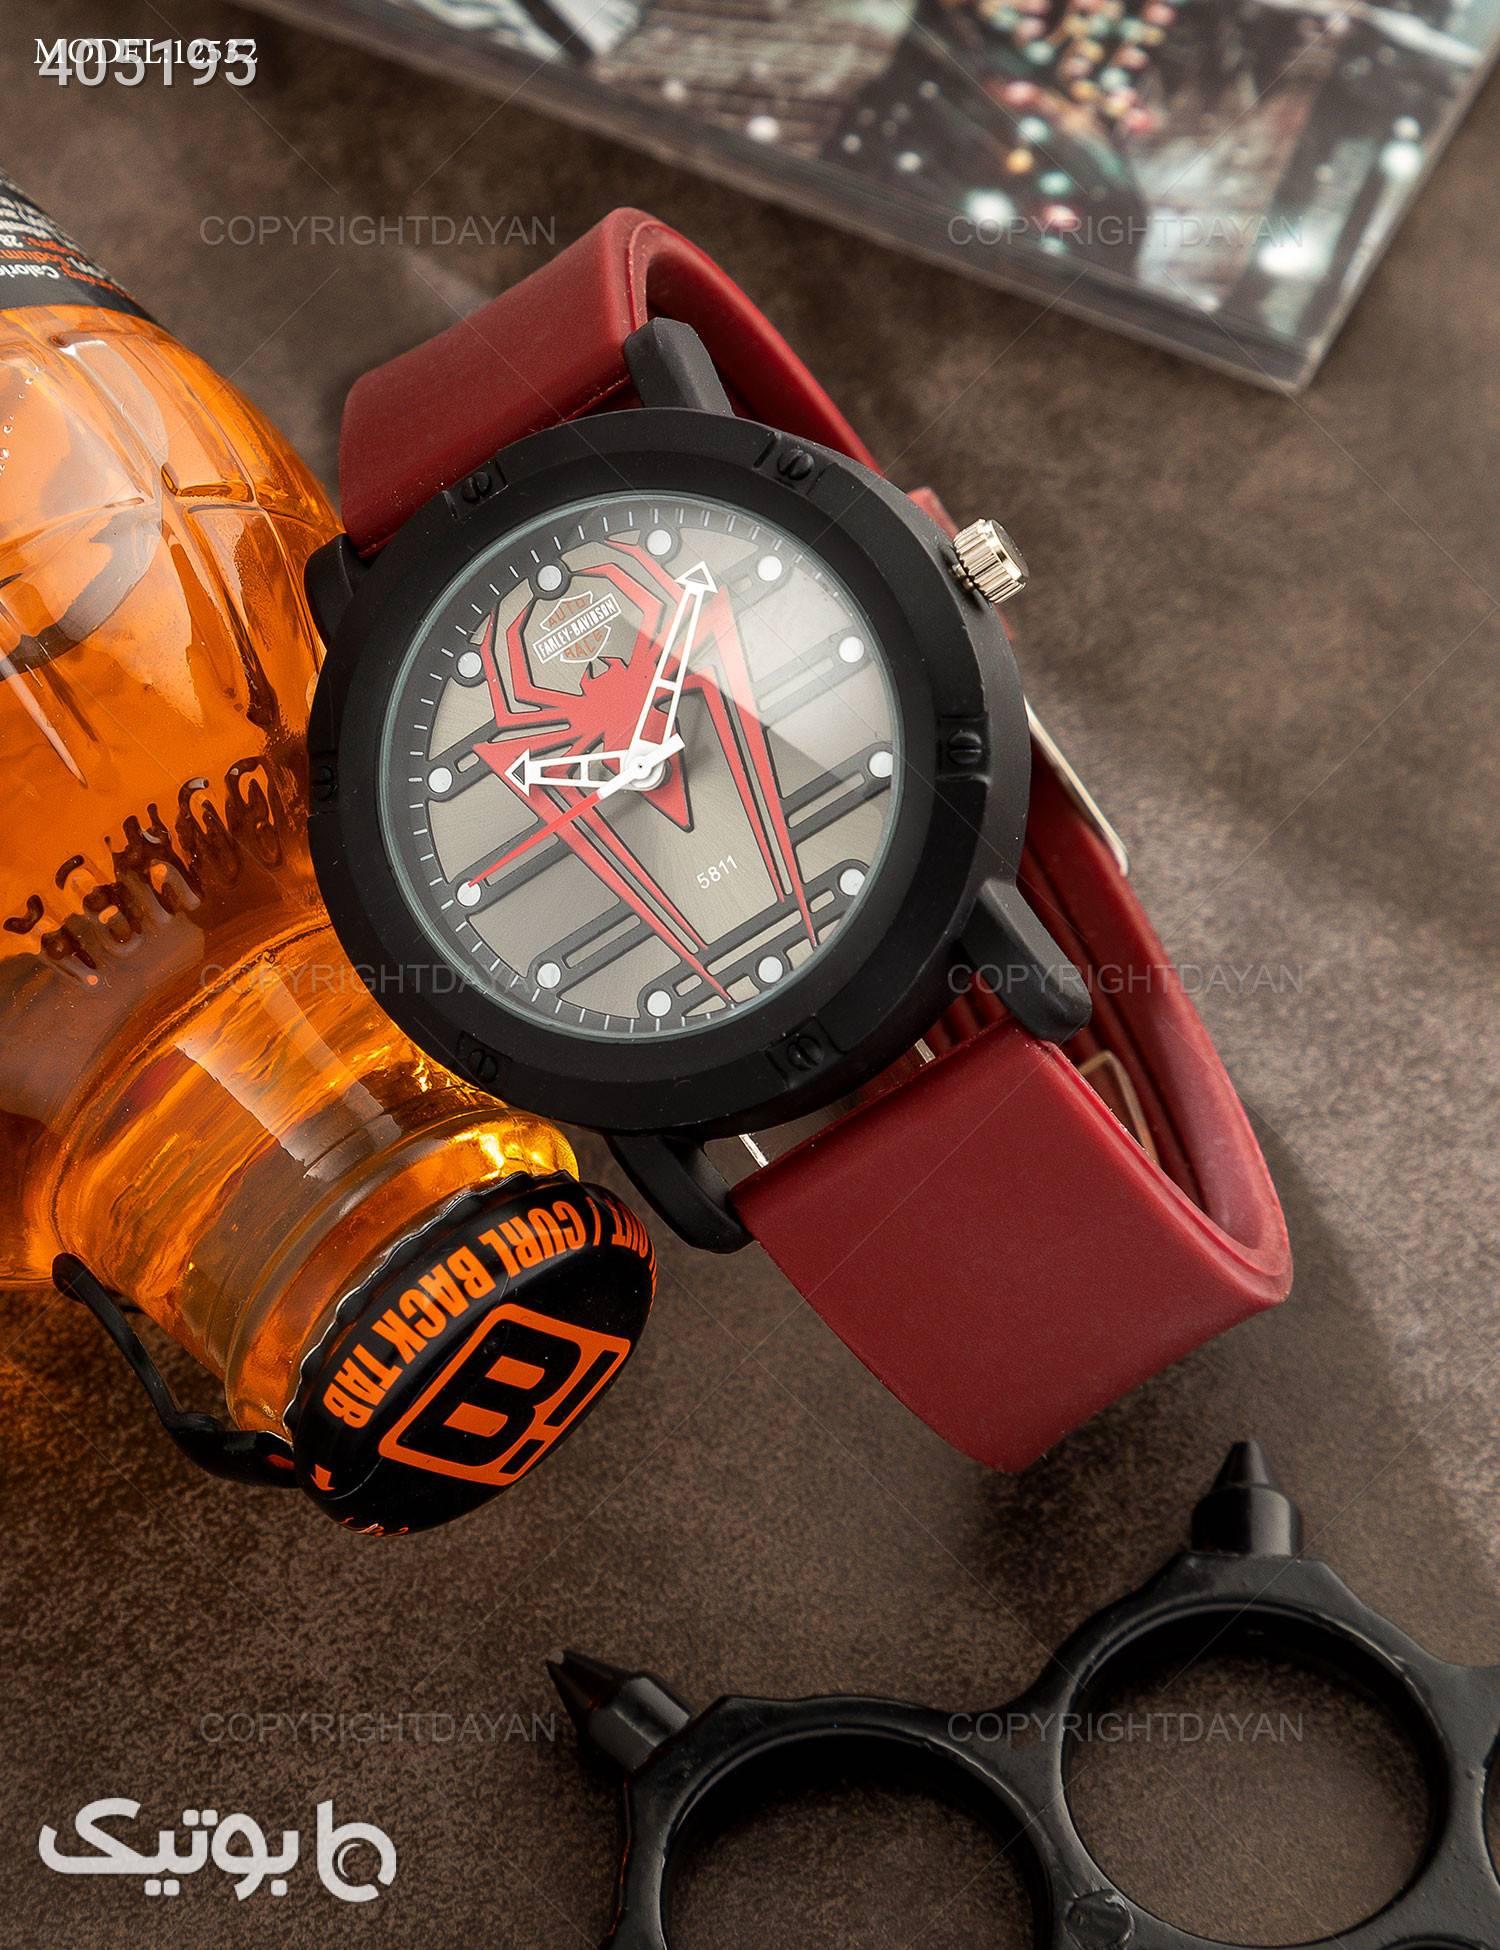 ساعت مچی مردانه Araz مدل 12532 زرشکی ساعت